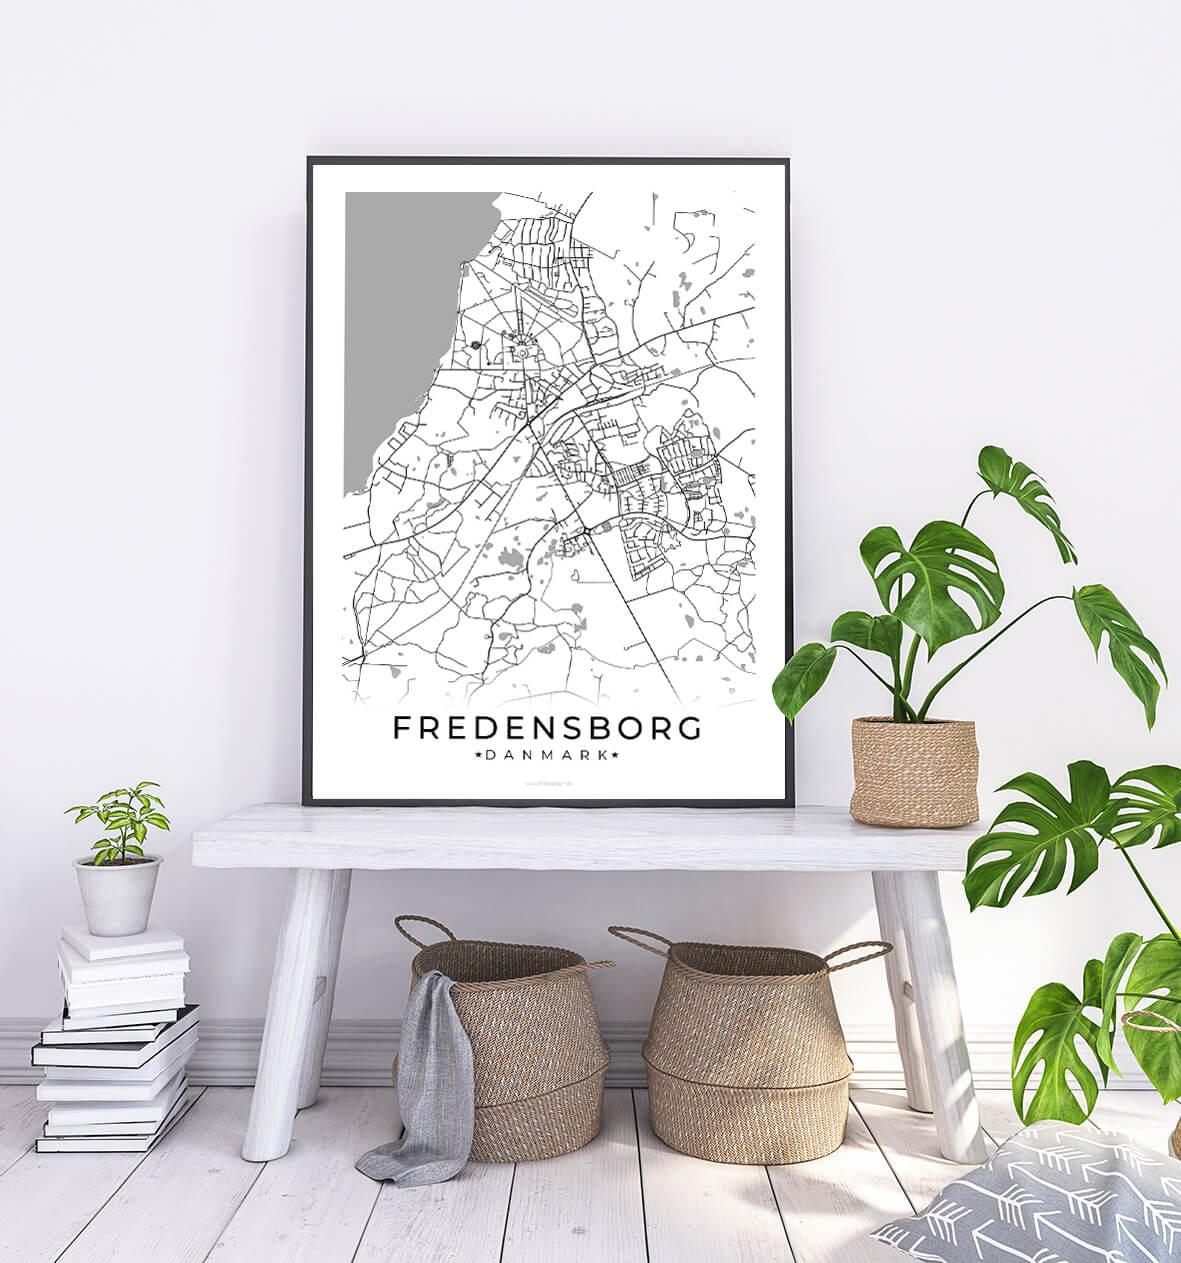 Fredensborg-hvid-byplakat-1